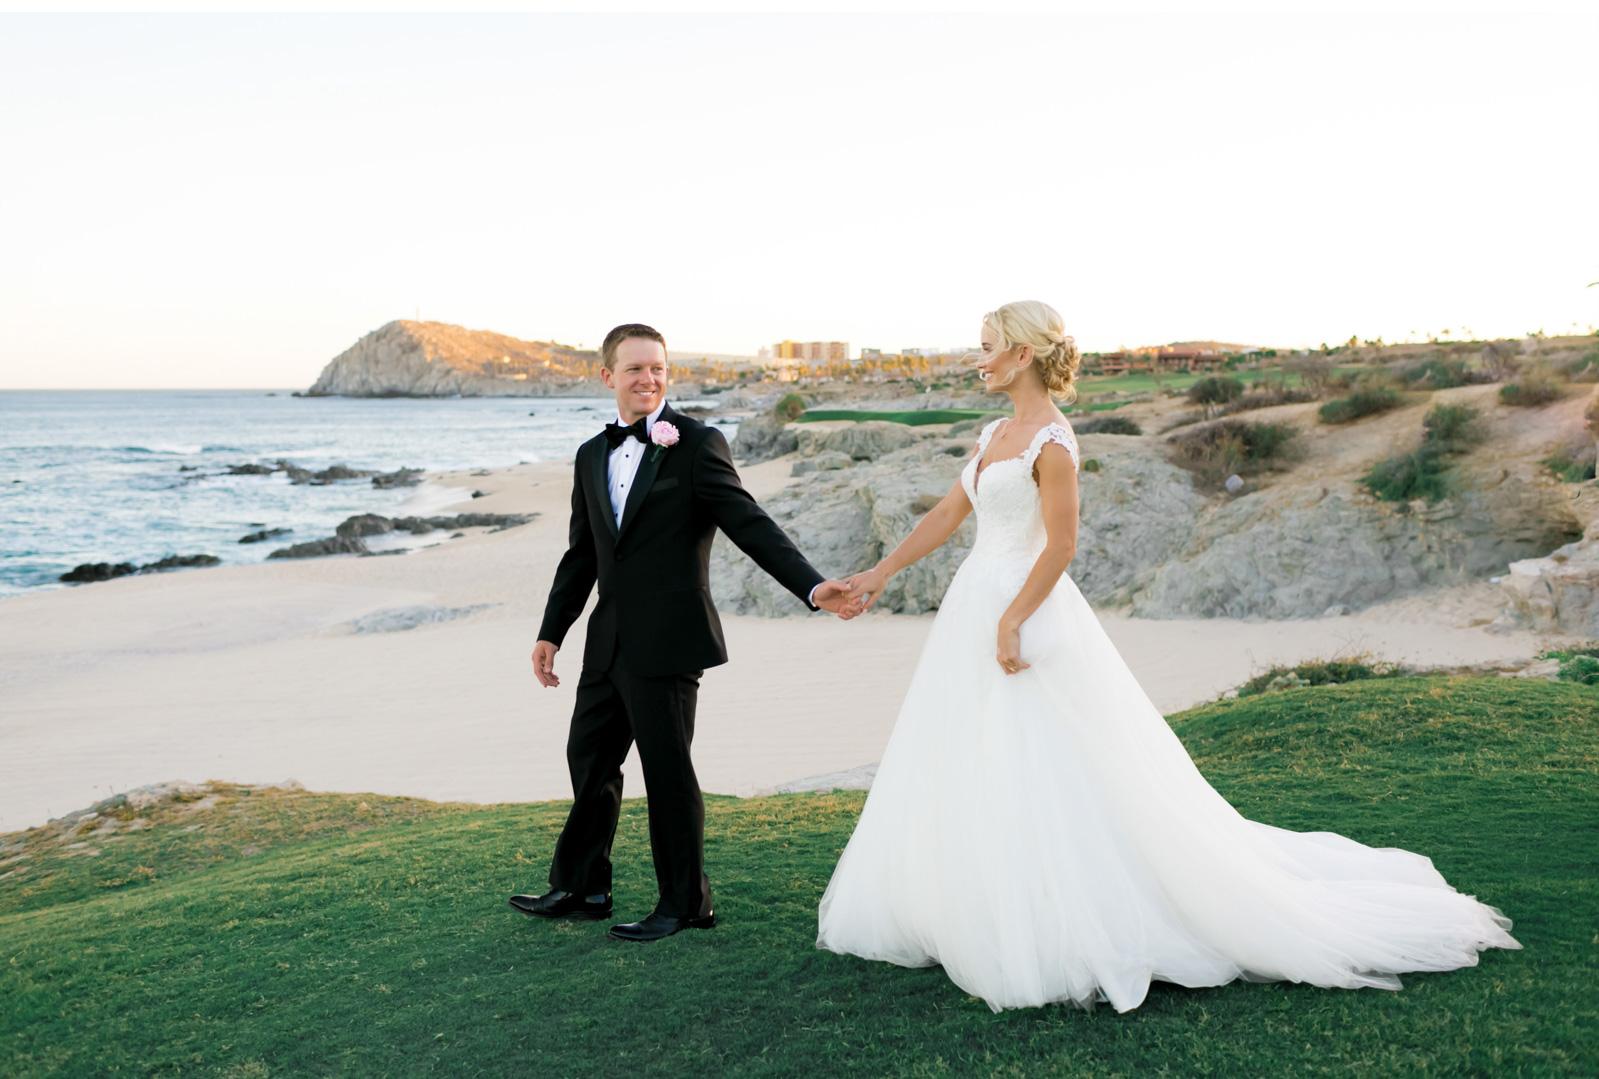 Hawaii-Destination-Wedding-Natalie-Schutt-Photography-Style-Me-Pretty_14.jpg